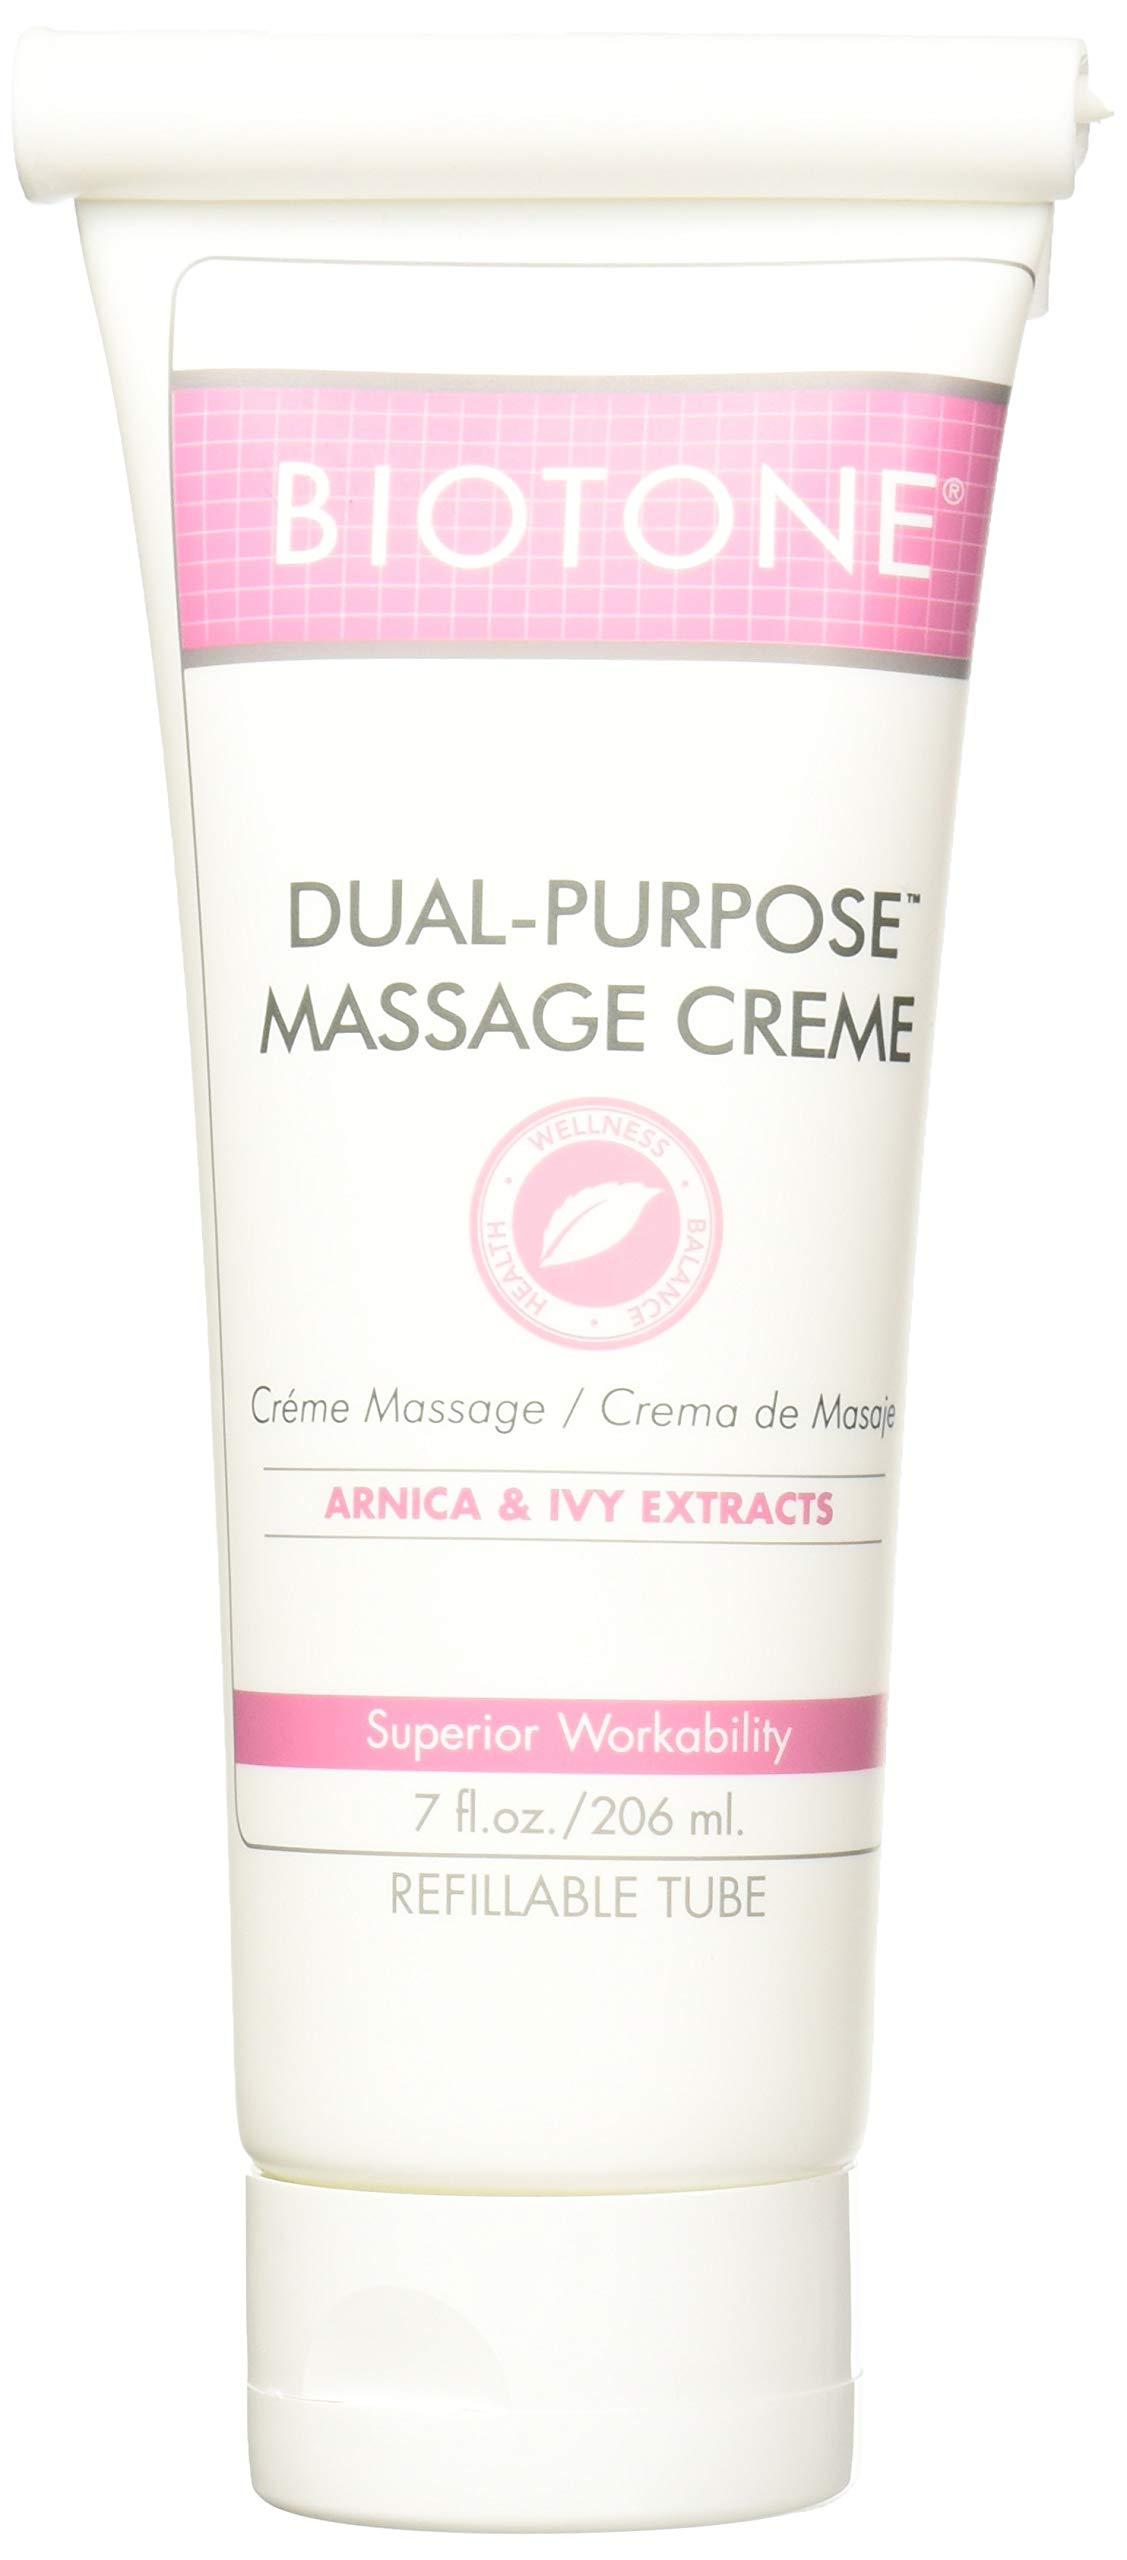 Biotone Dual Purpose Massage Creme 7 oz - Pack of 2 Tubes by Biotone